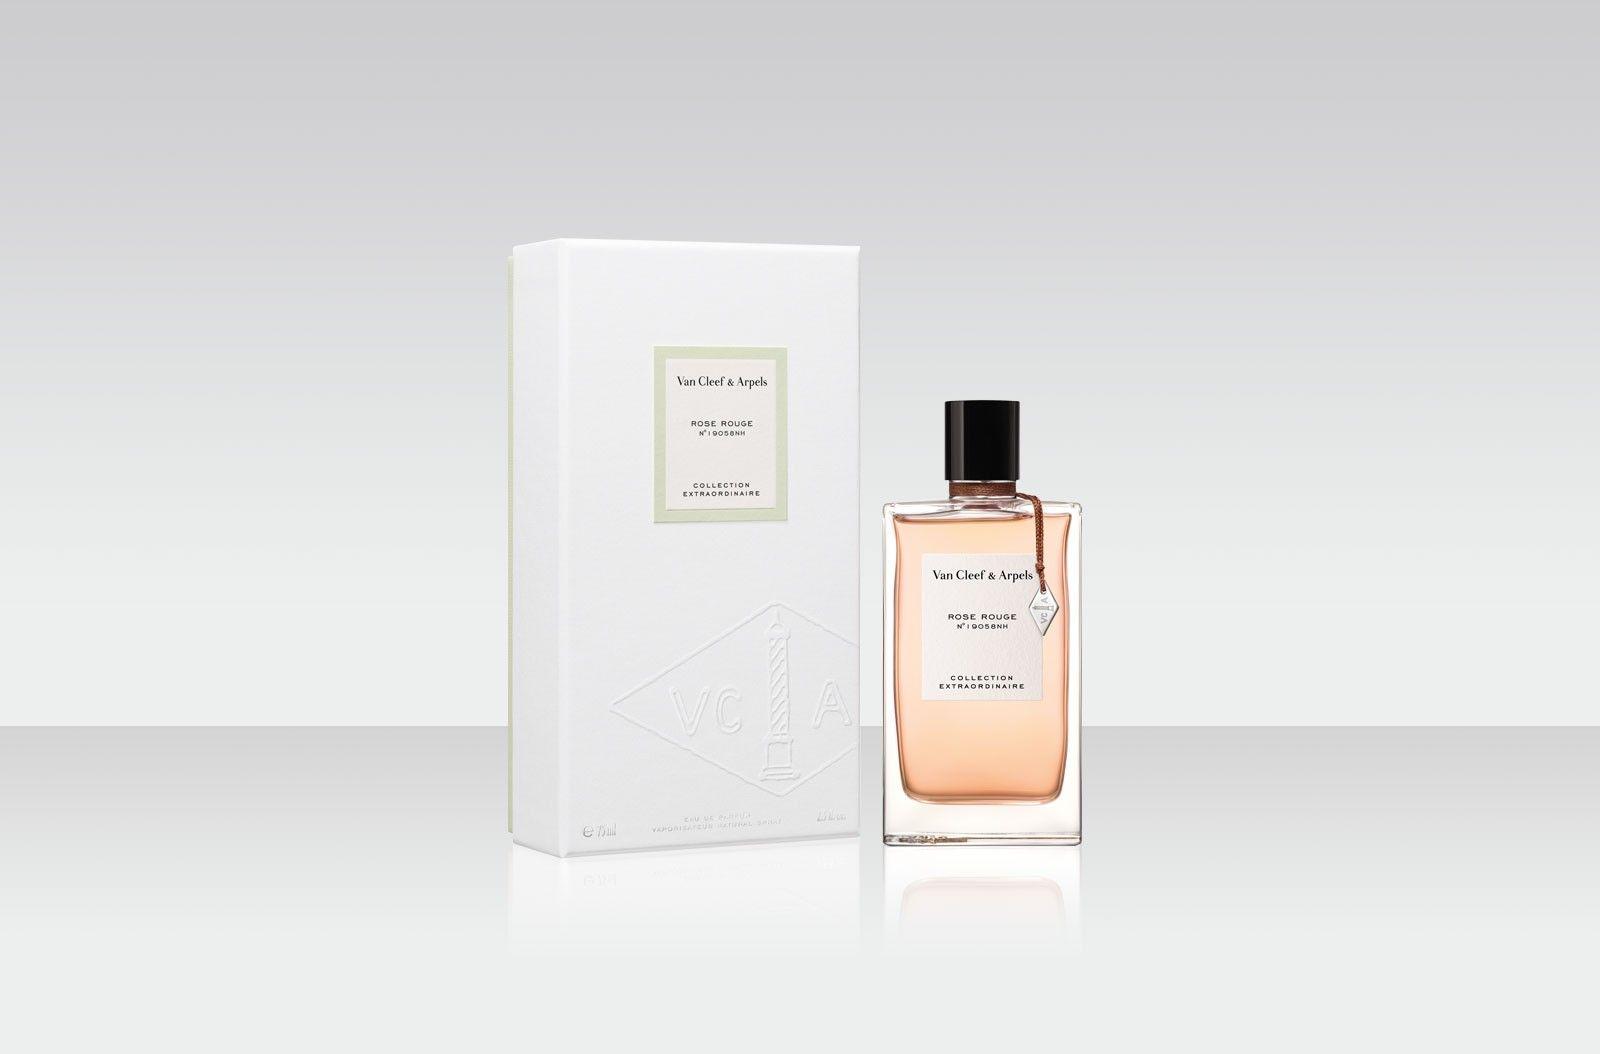 парфюм ван клиф арпелс отзывы